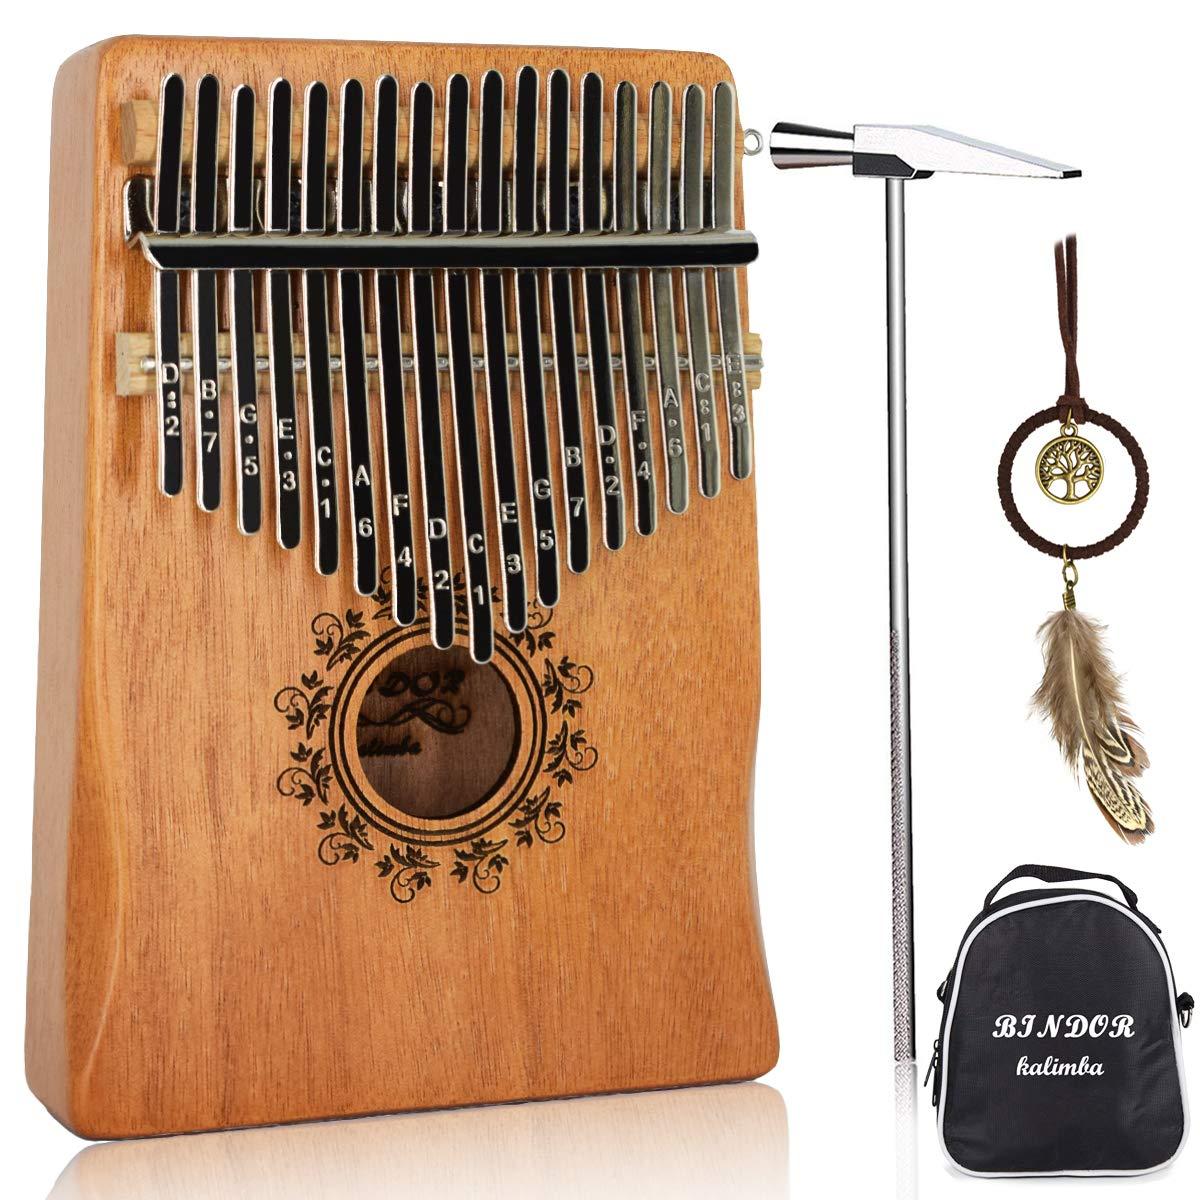 17 Key Kalimba Thumb Piano, Bindor Finger Piano Mbira Kalimba Solid Mahogany Body Portable Easy-to-learn Musical Instrument with Tuning Hammer(Wood Color) by BinDor